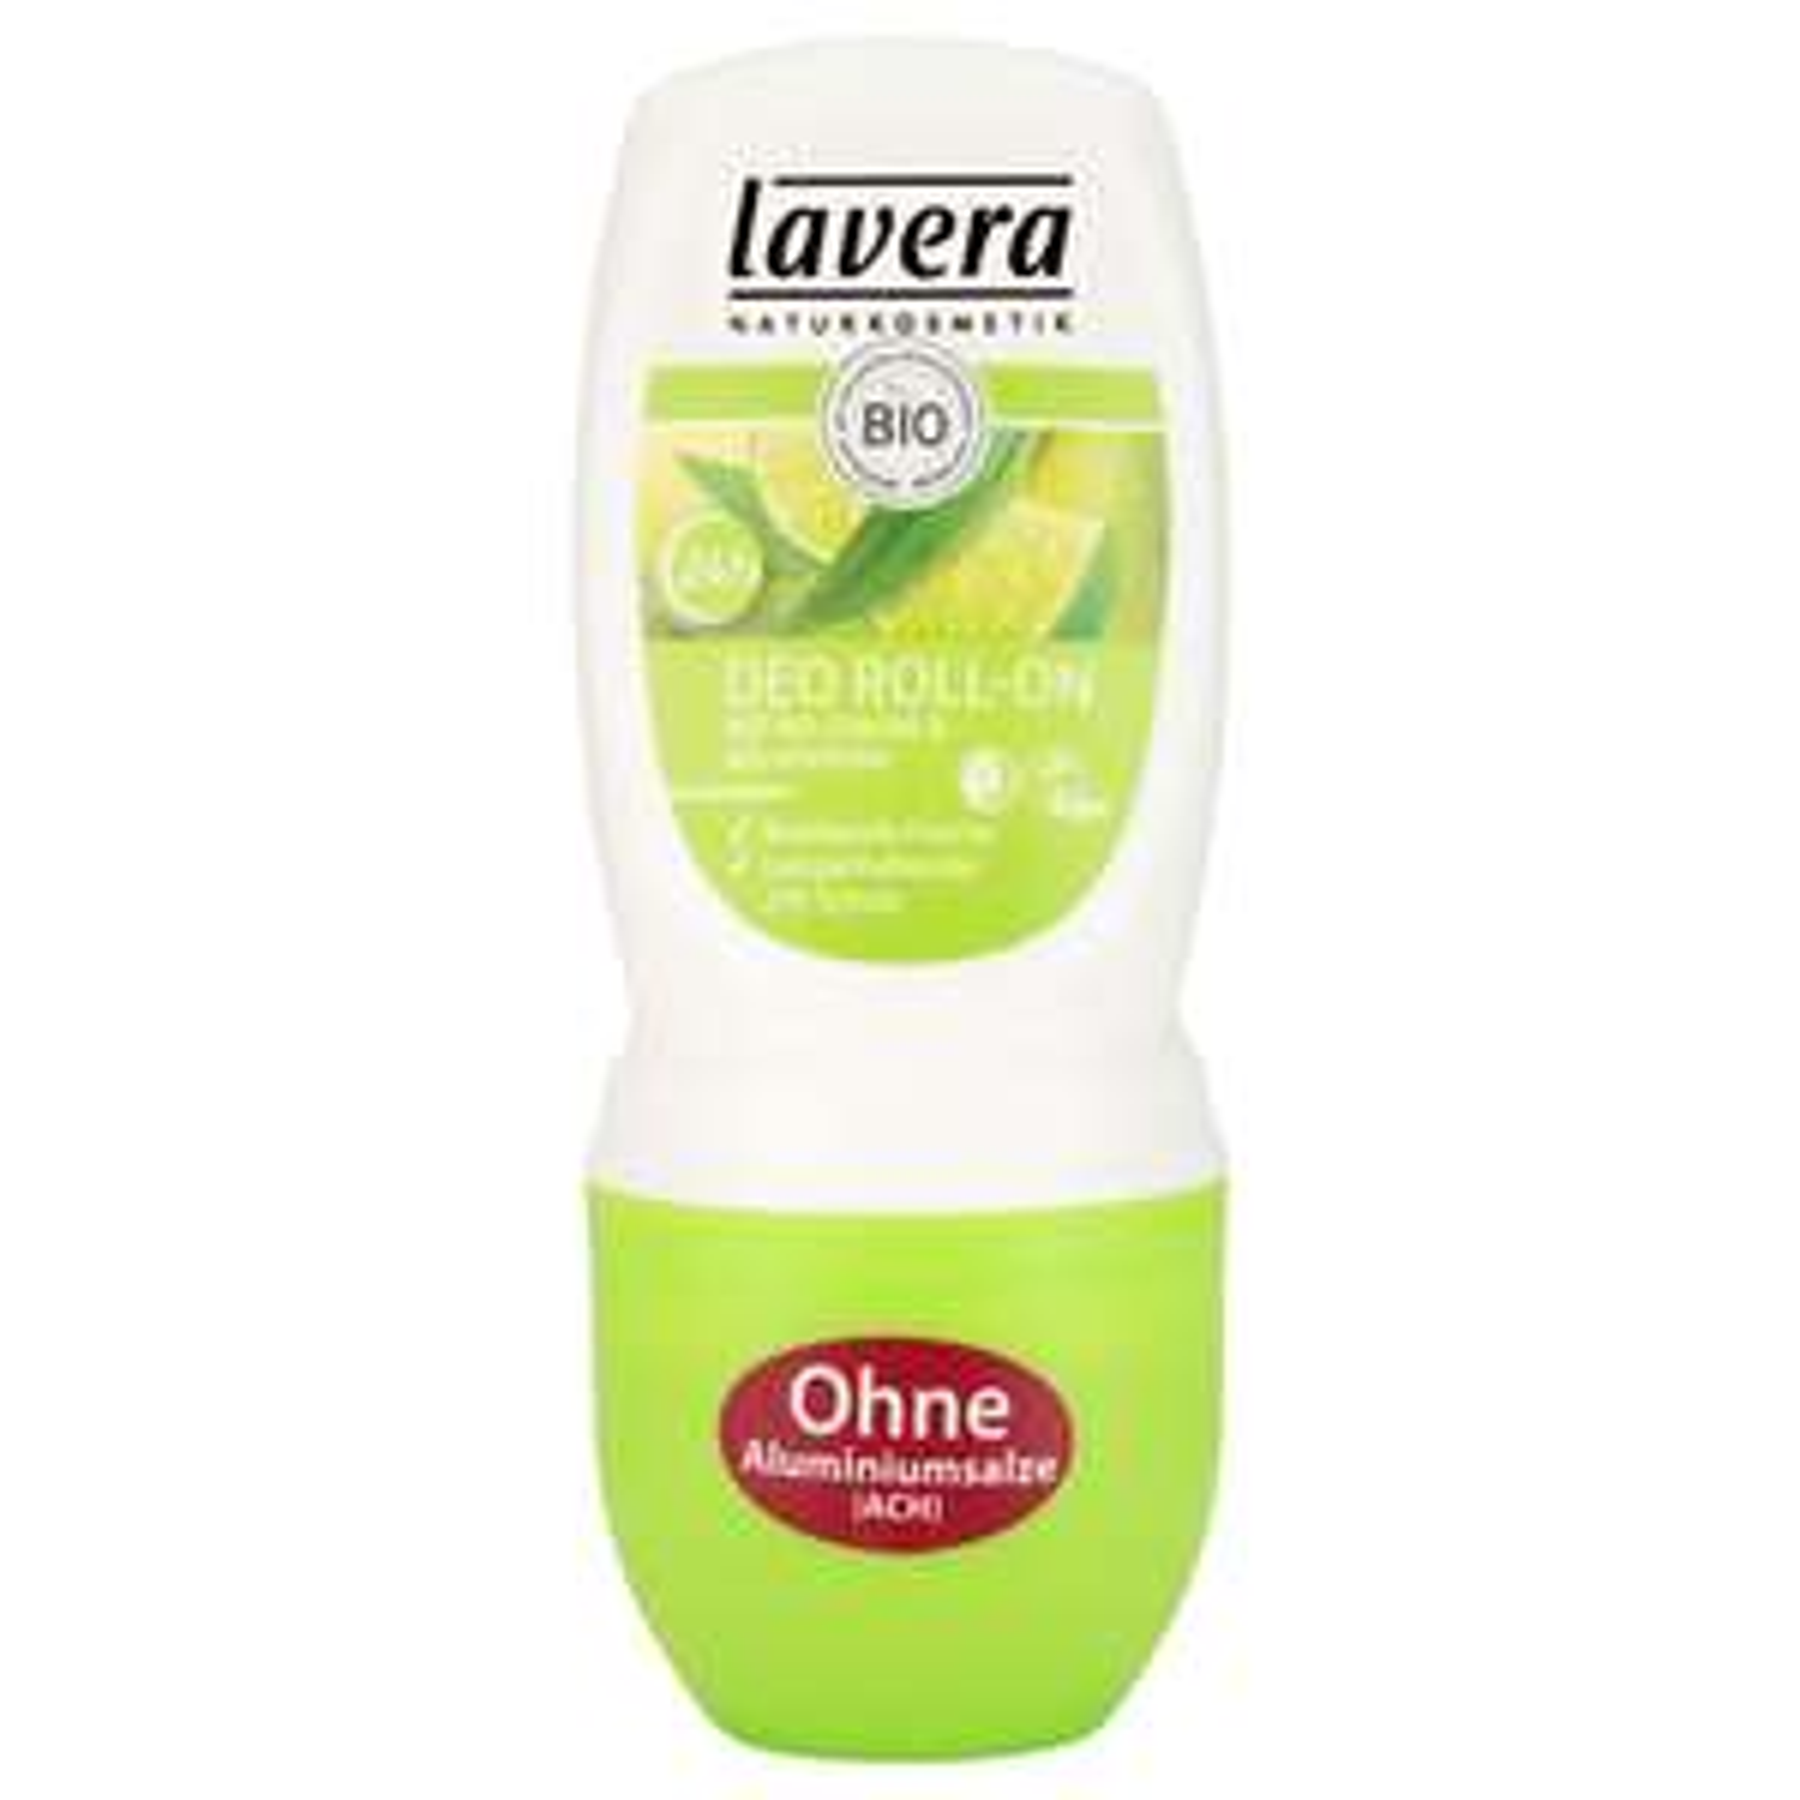 Lavera Naturkosmetik Deodorant